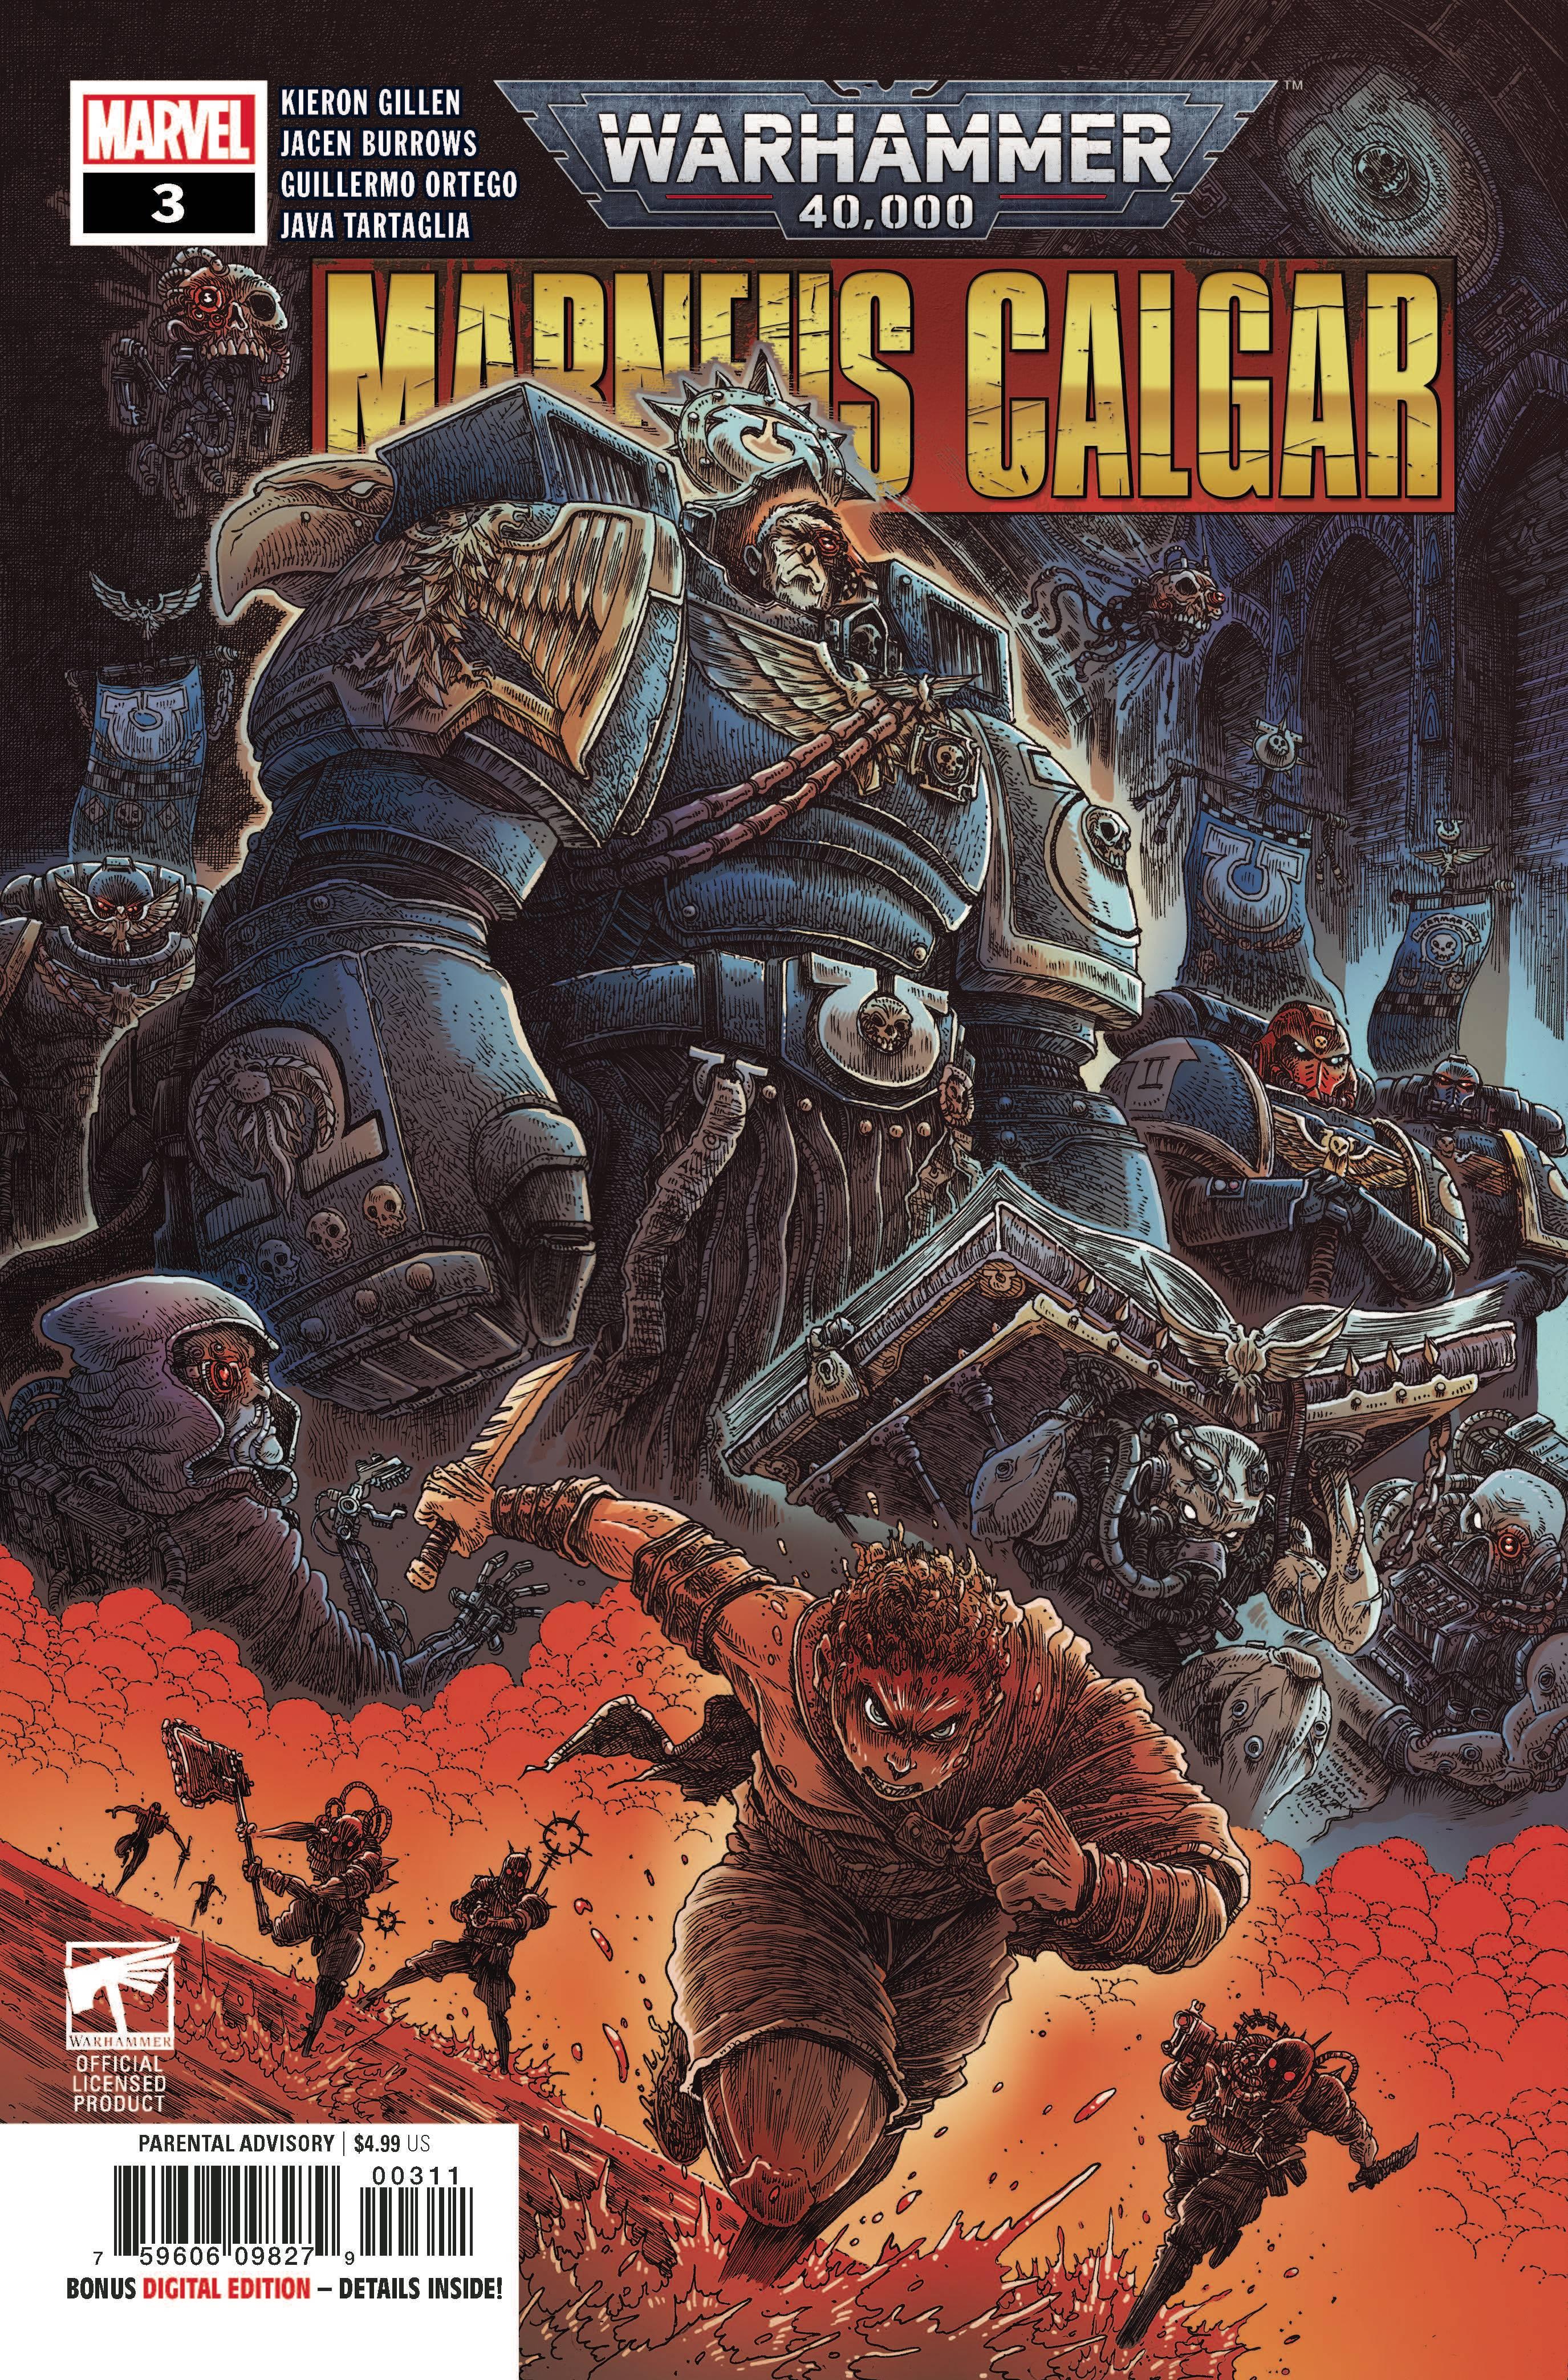 Warhammer 40,000: Marneus Calgar #3 (2020)